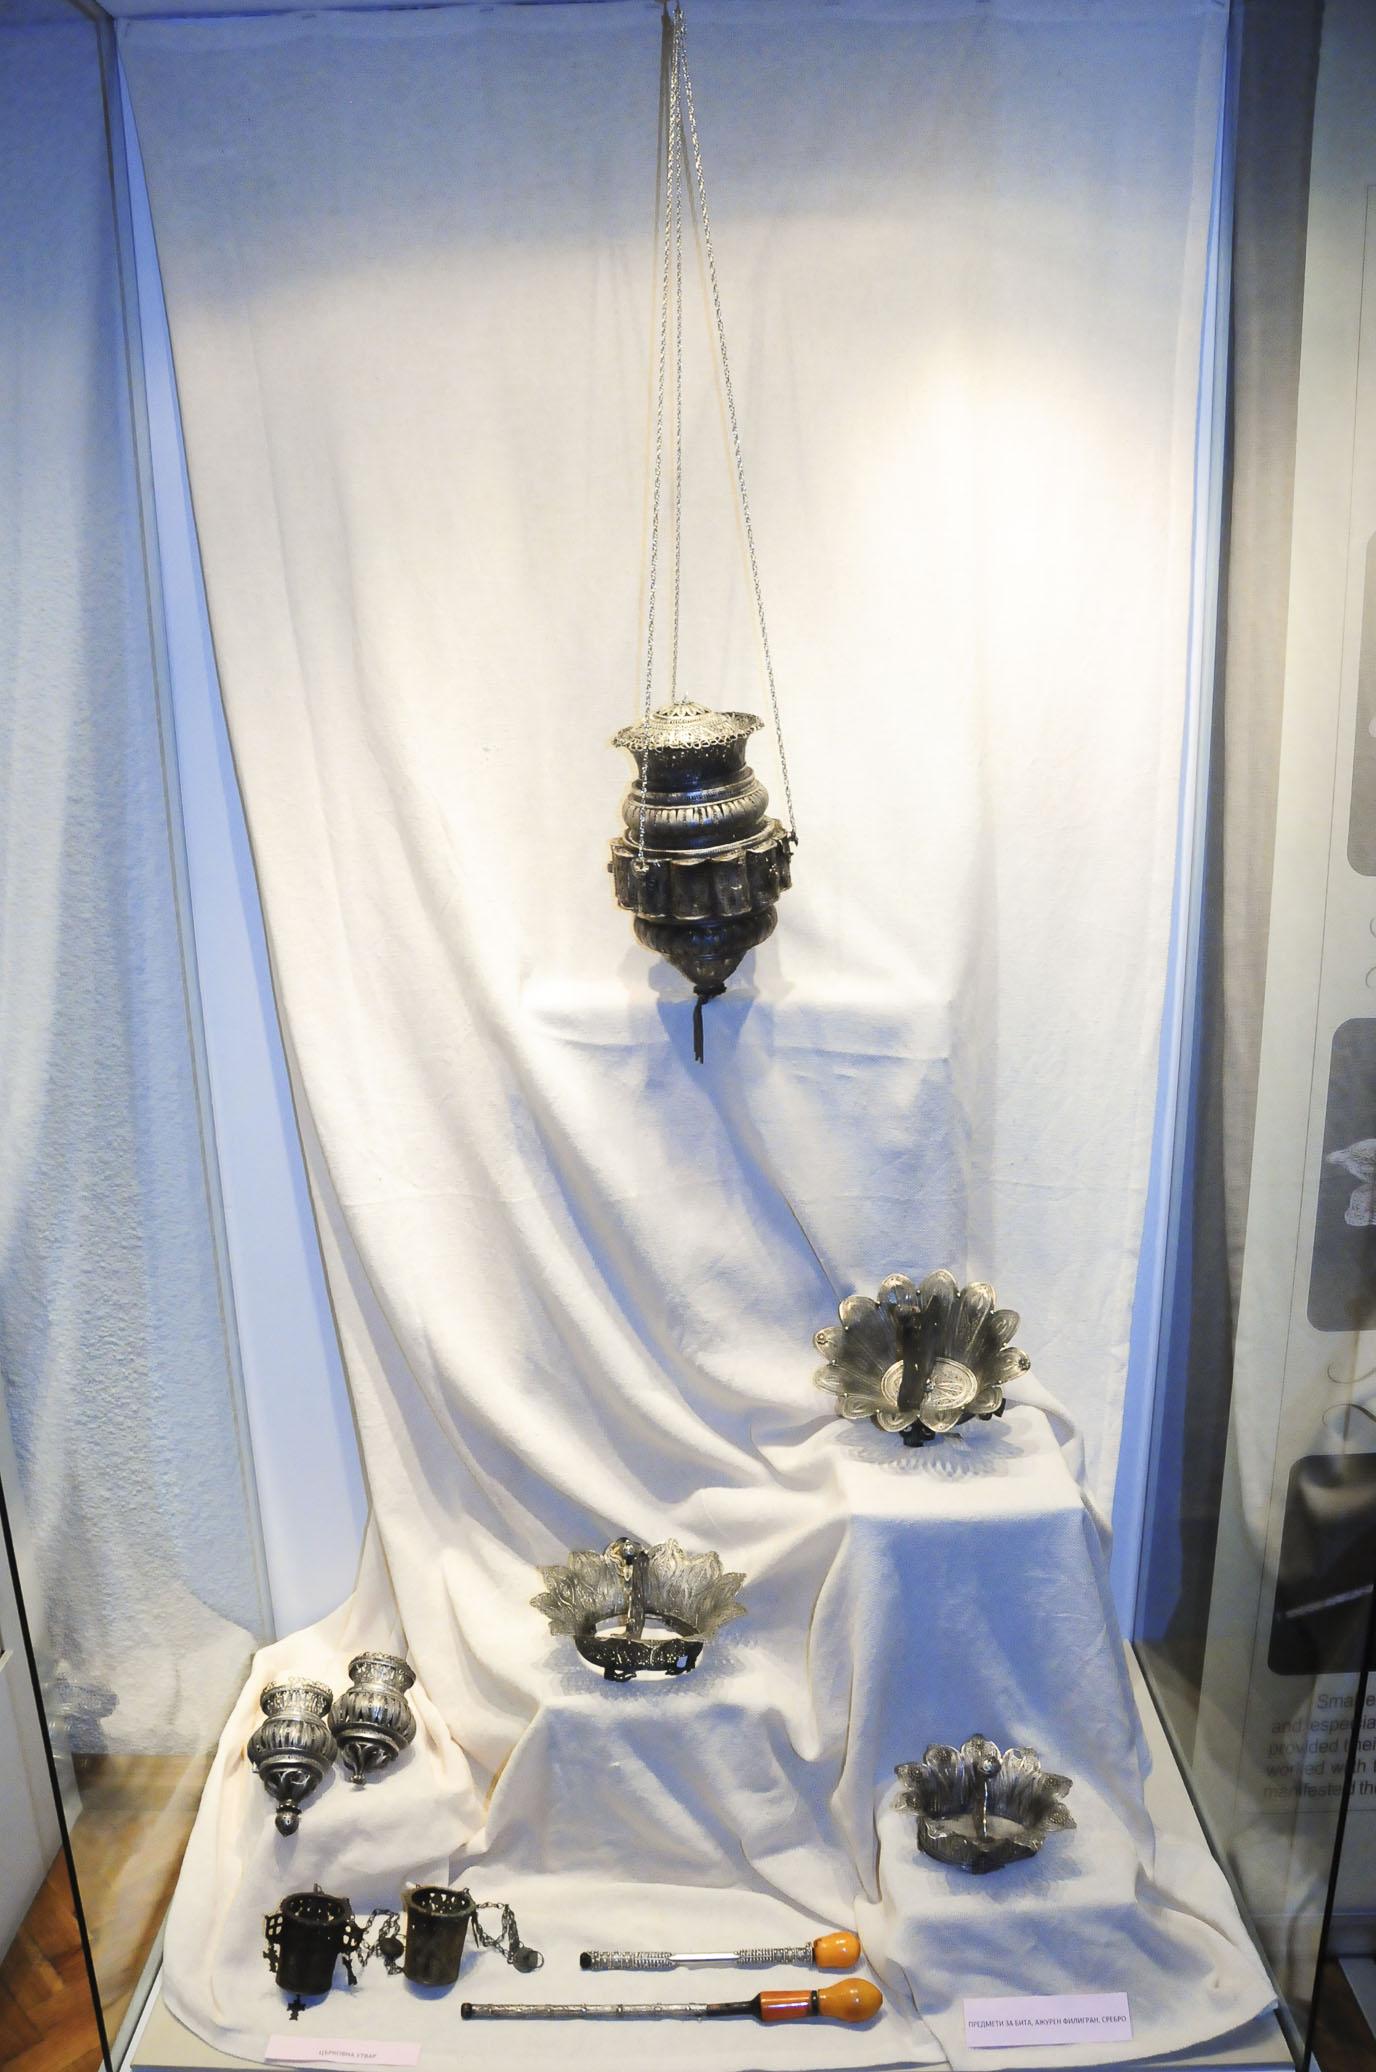 troyan-museum-ot-zlatnite-im-ruce-23